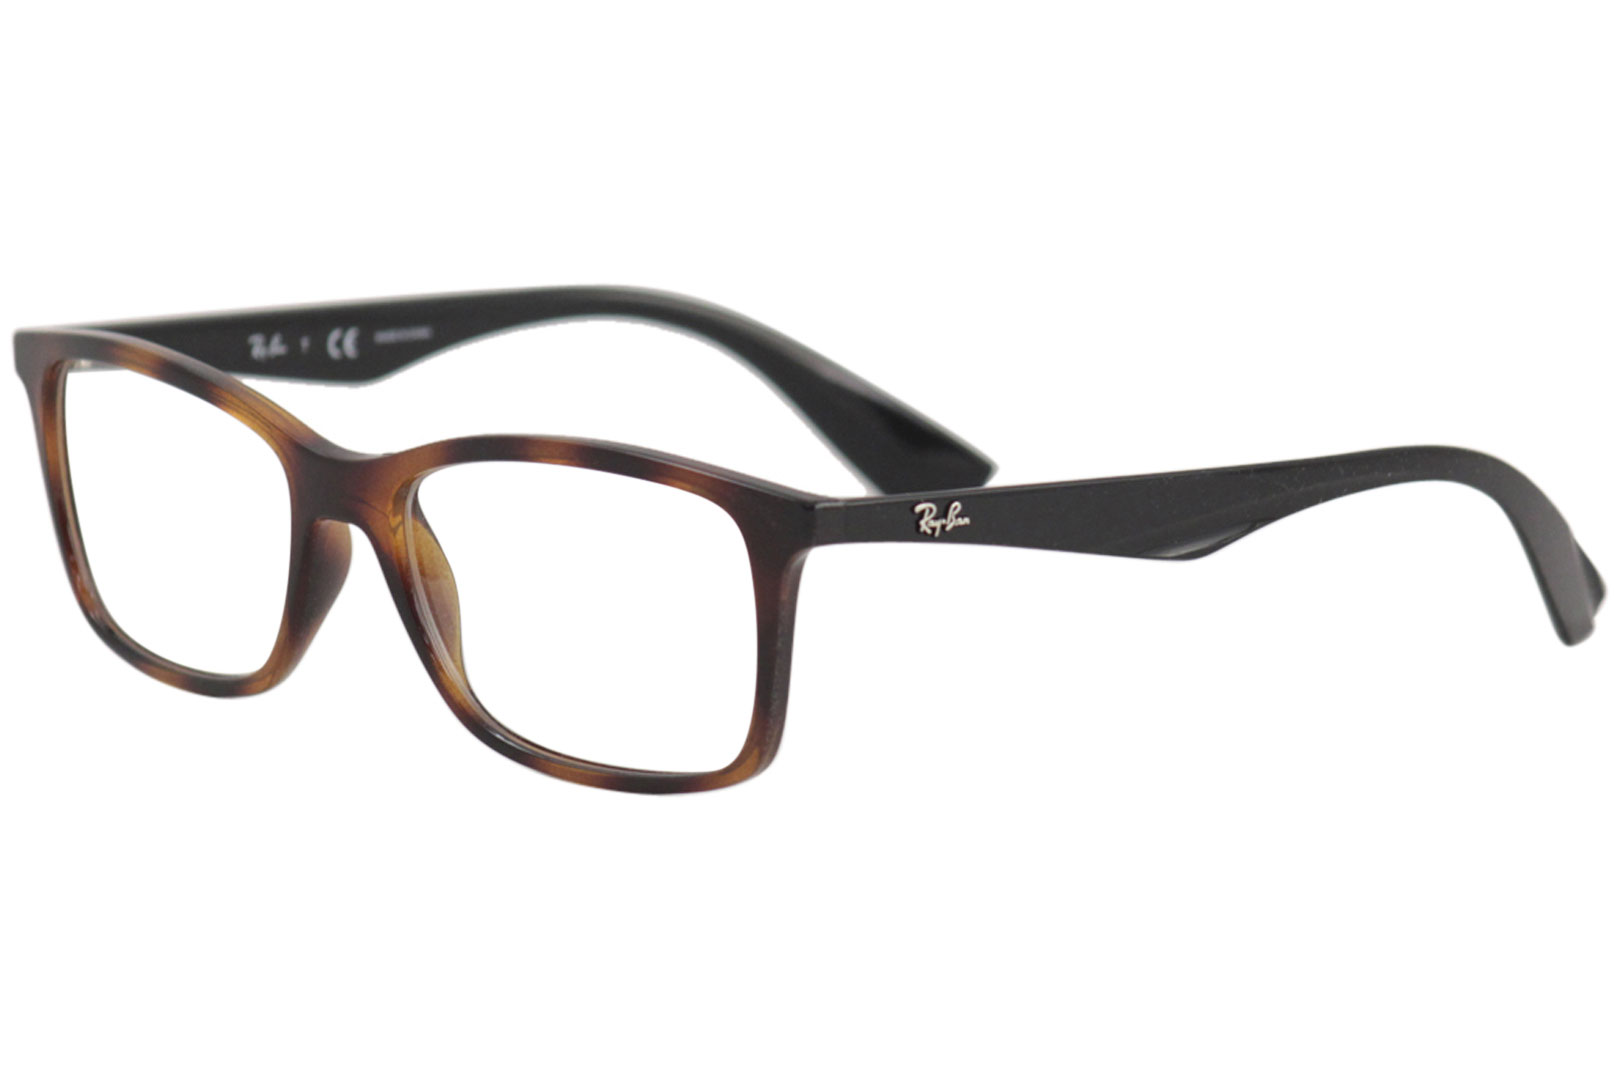 be2ca2c02b8 Ray Ban Eyeglasses RB7047 RX 7047 5847 Red Havana RayBan Optical ...